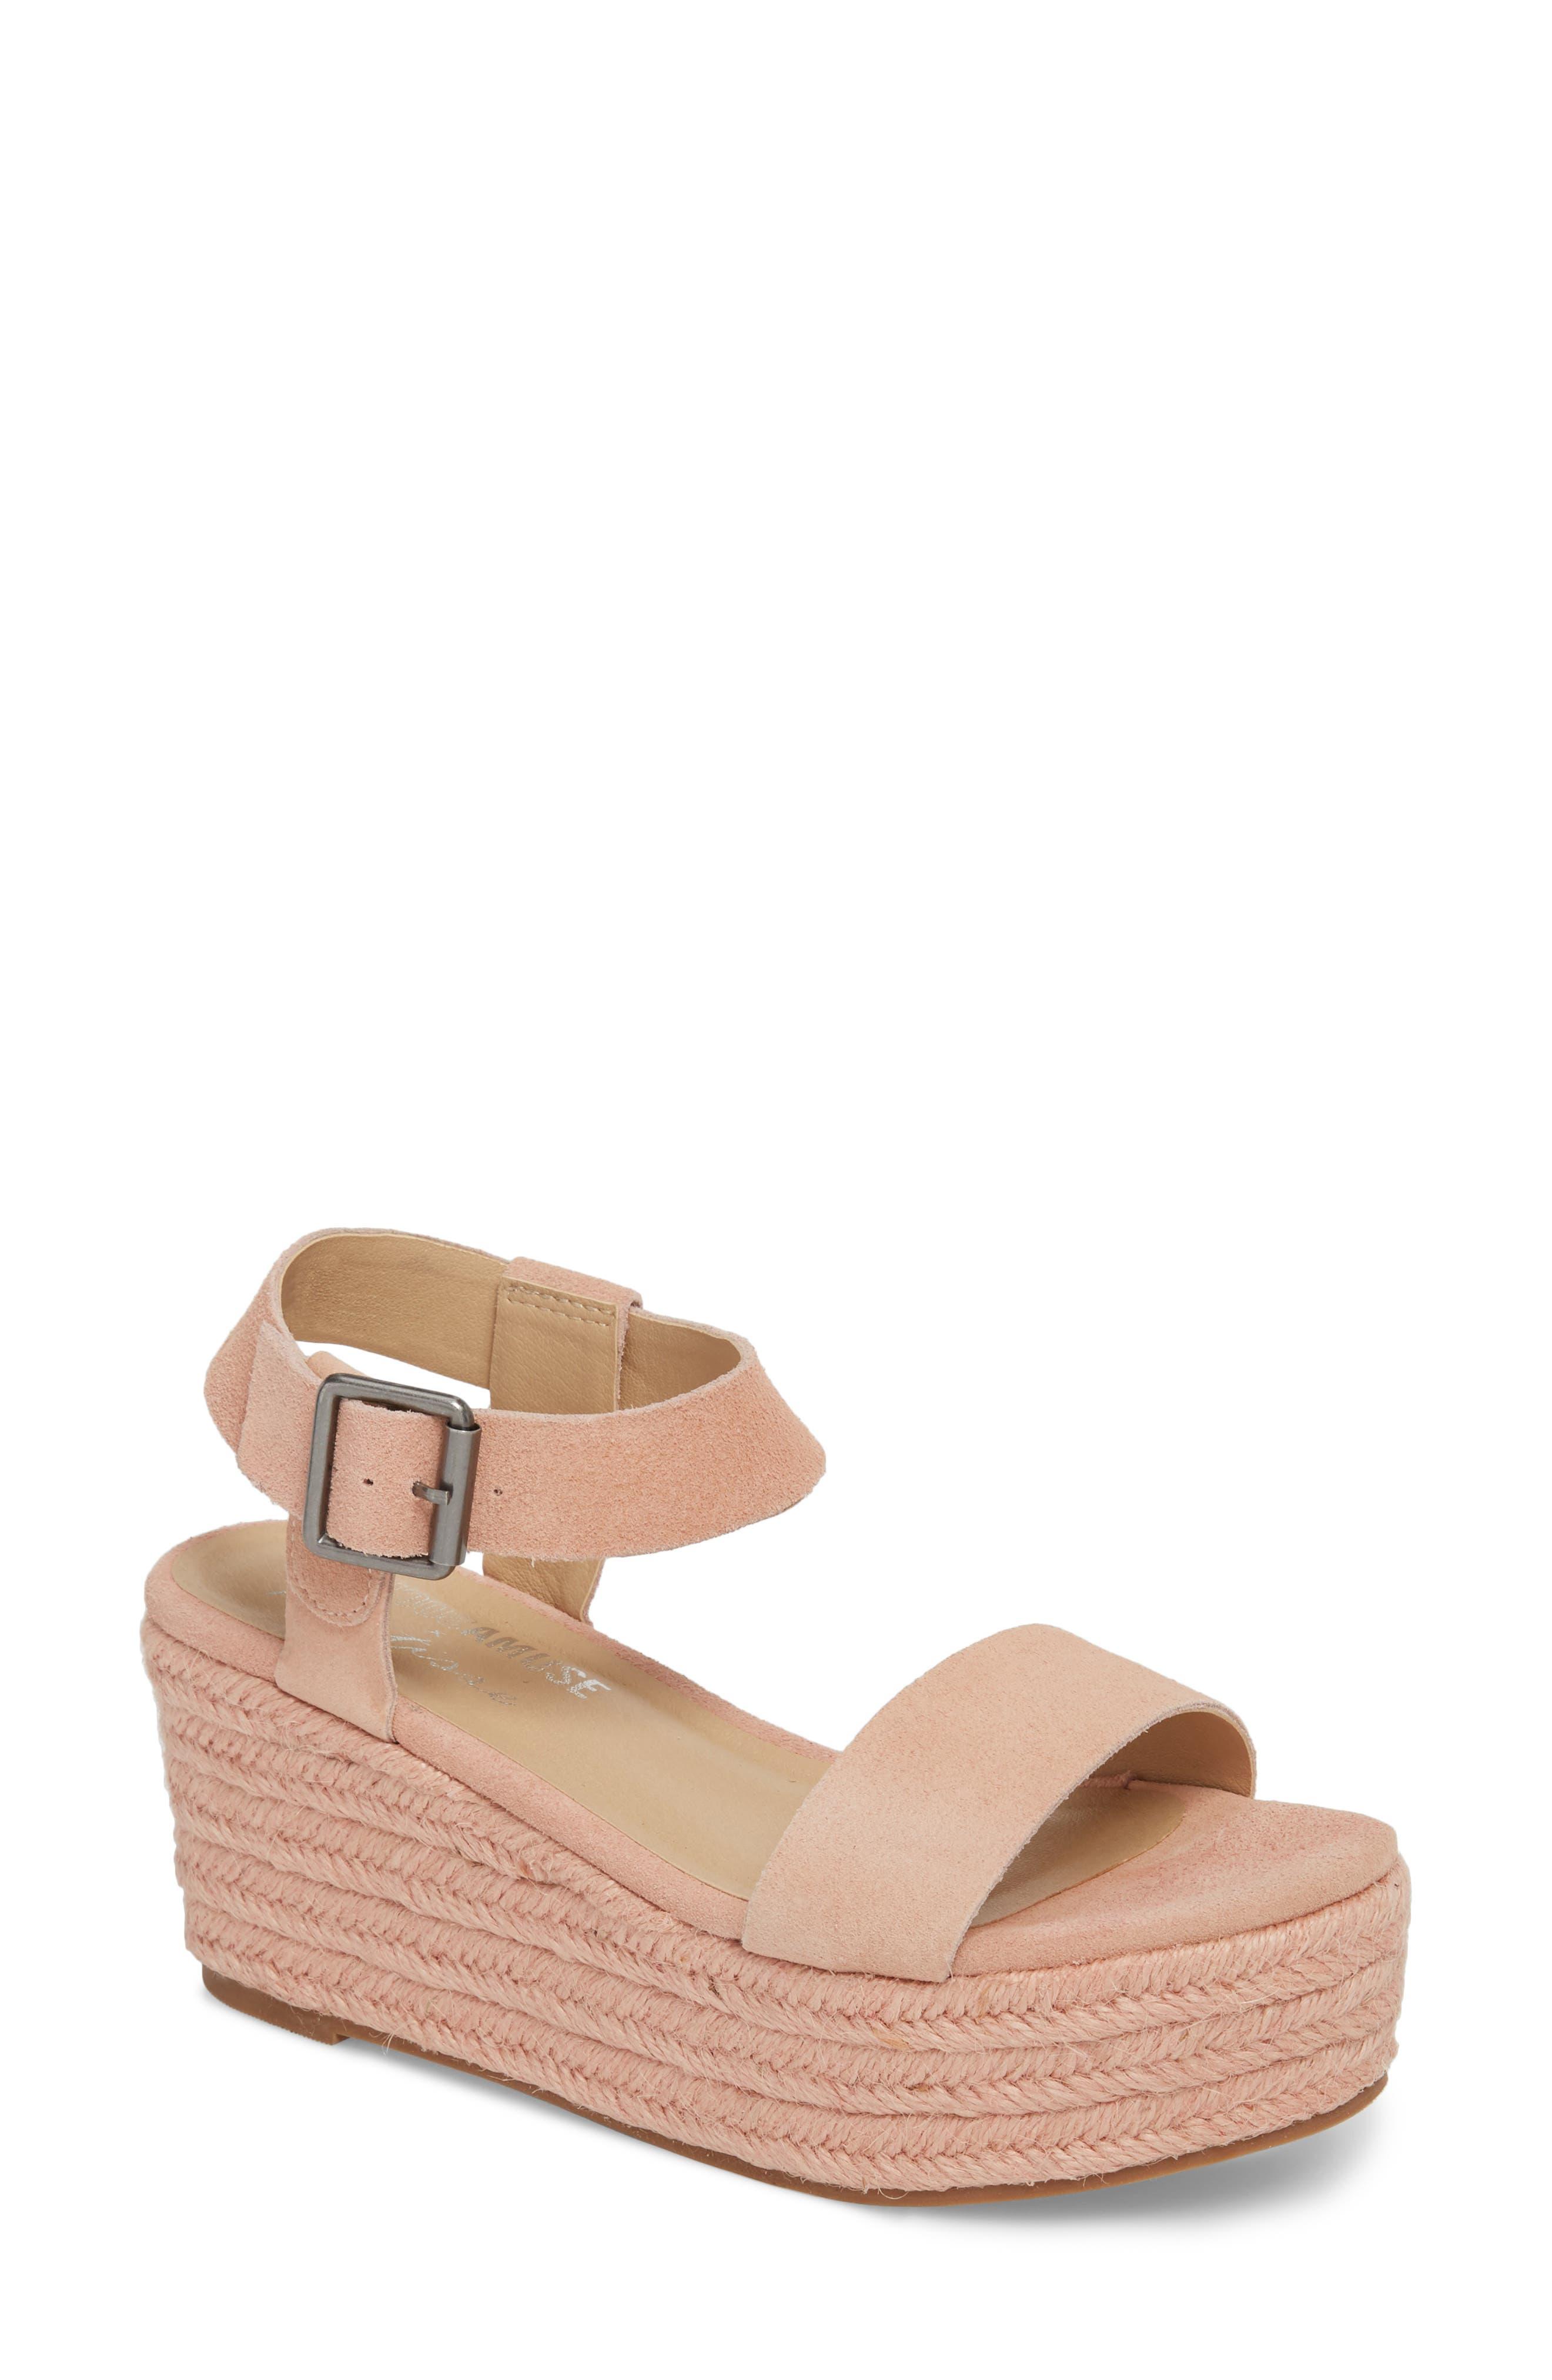 Amuse Society x Matisse Siena Wedge Sandal (Women)